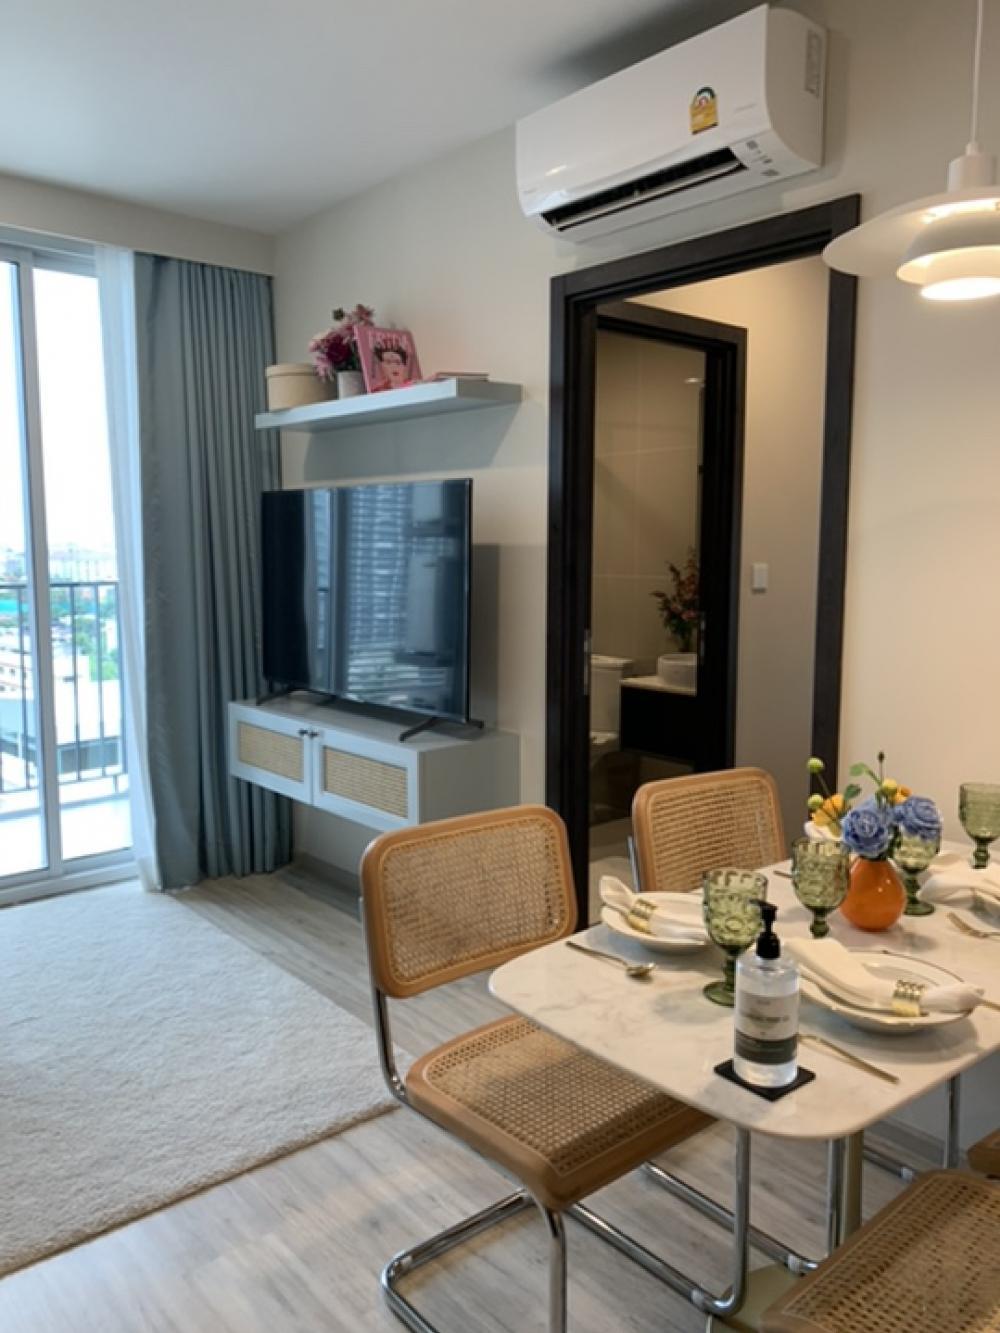 For SaleCondoRatchadapisek, Huaikwang, Suttisan : Luxury condo for sale, next to MRT Huailwang, Huai Khwang 75 m. MRT Huai Khwang 2/2 bed 51 sq m, price 6,990,000 baht (only one room)